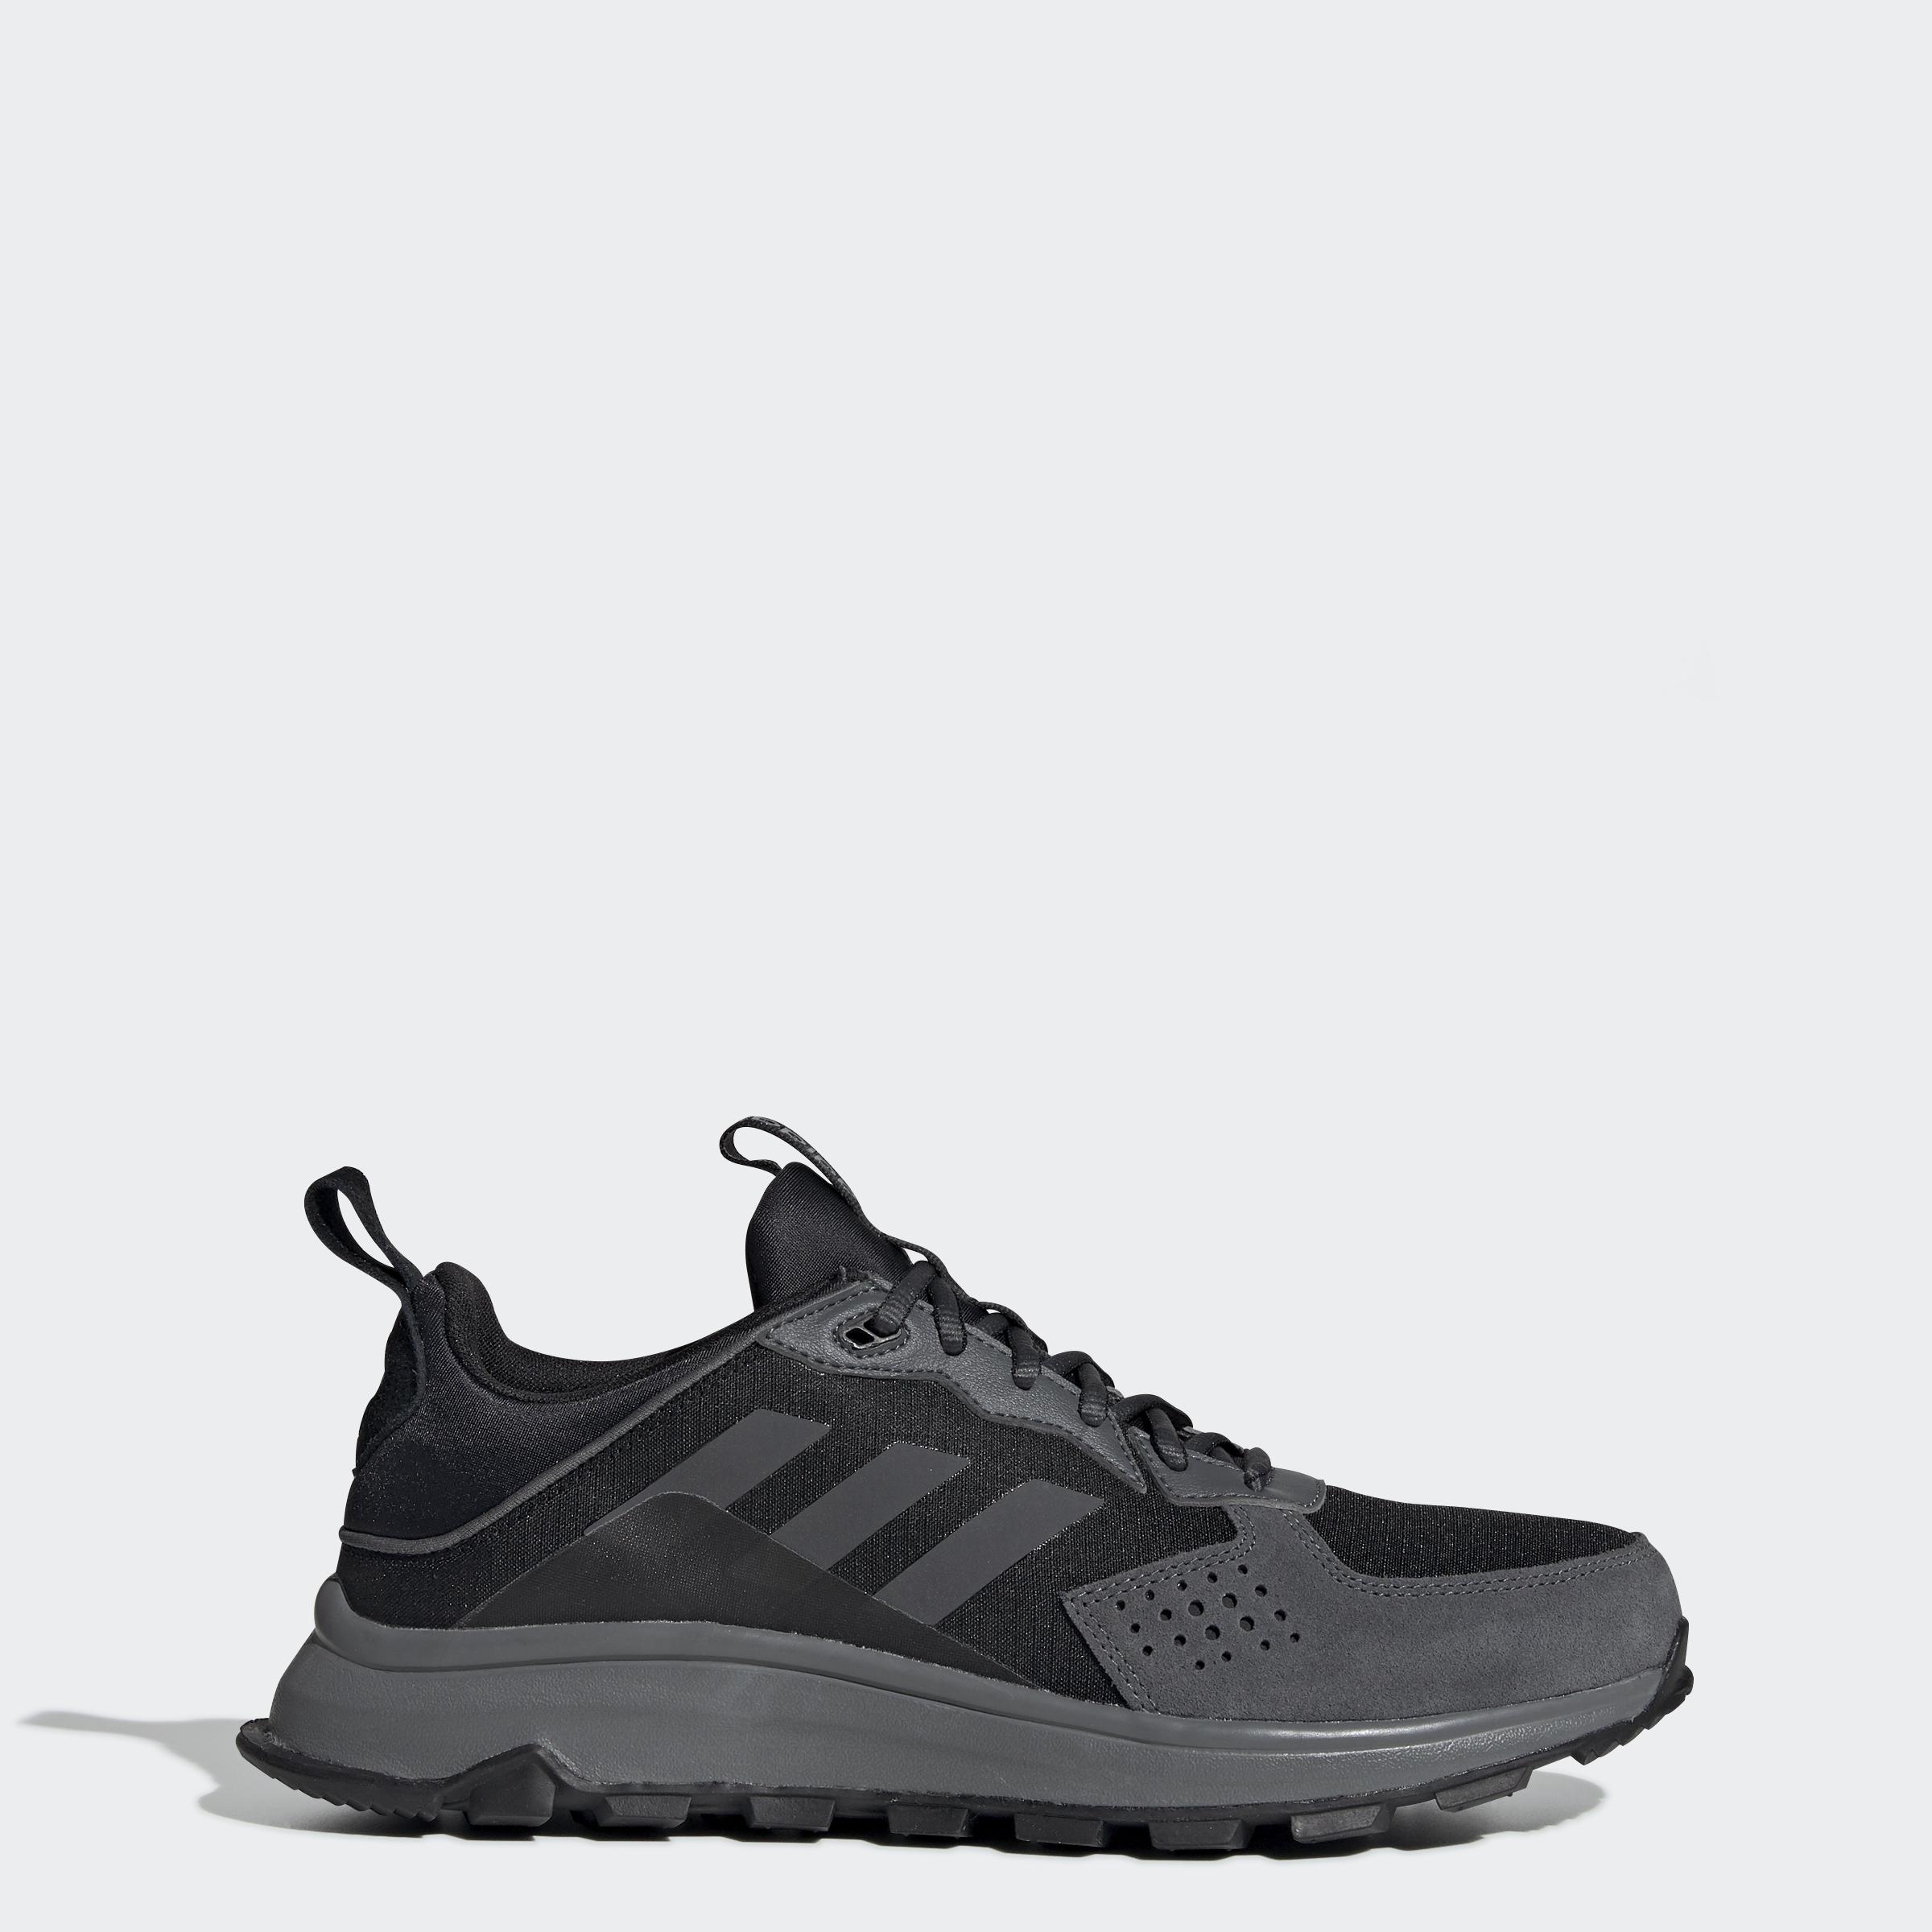 Details zu adidas Response Trail Wide Shoes Men's